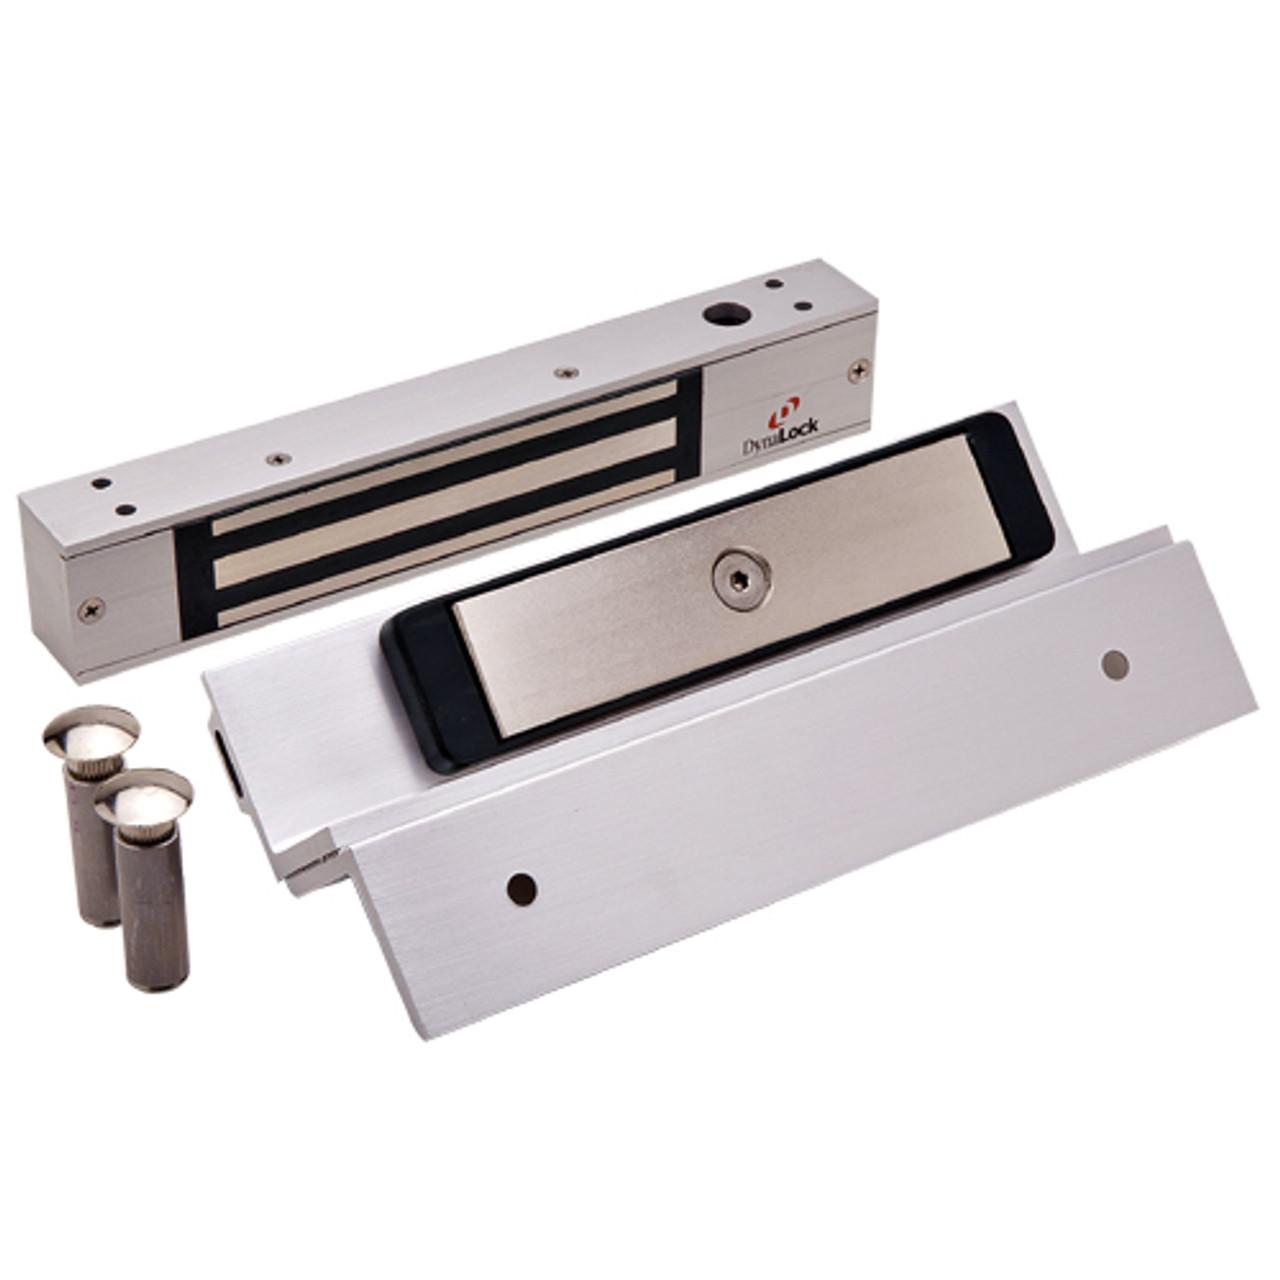 2511TJ-US28 DynaLock 2500 Series 650 LB Mini-Mag Single Electromagnetic Lock for Inswing Door in Satin Aluminum